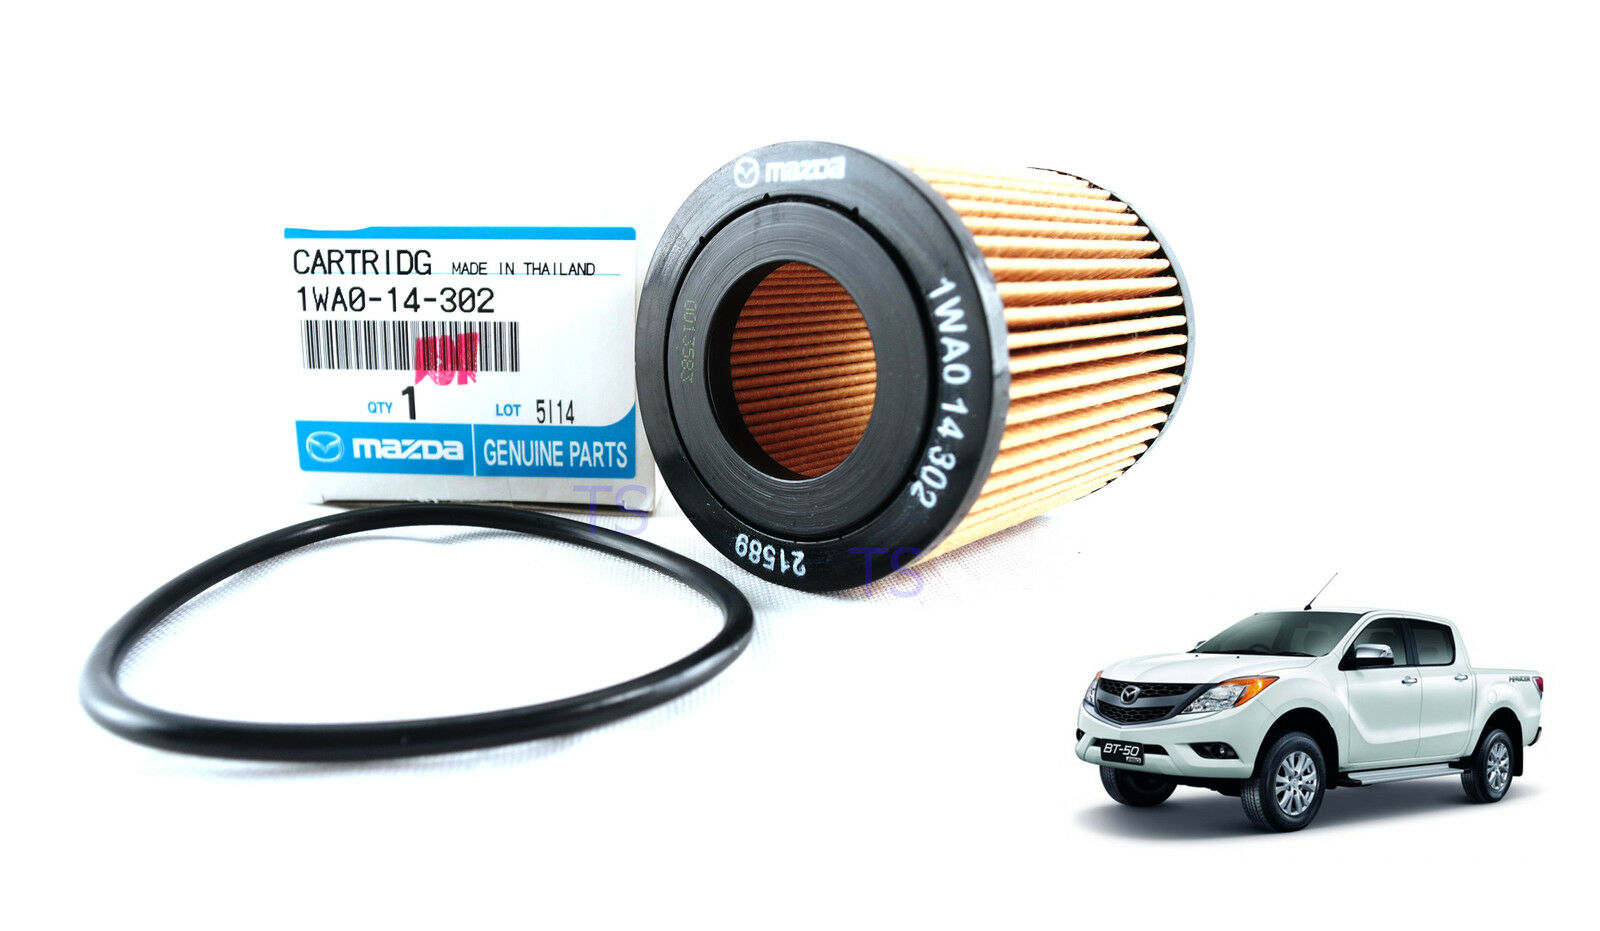 oil filter inc o ring 2.2l 3.2l cartridg for mazda bt 50